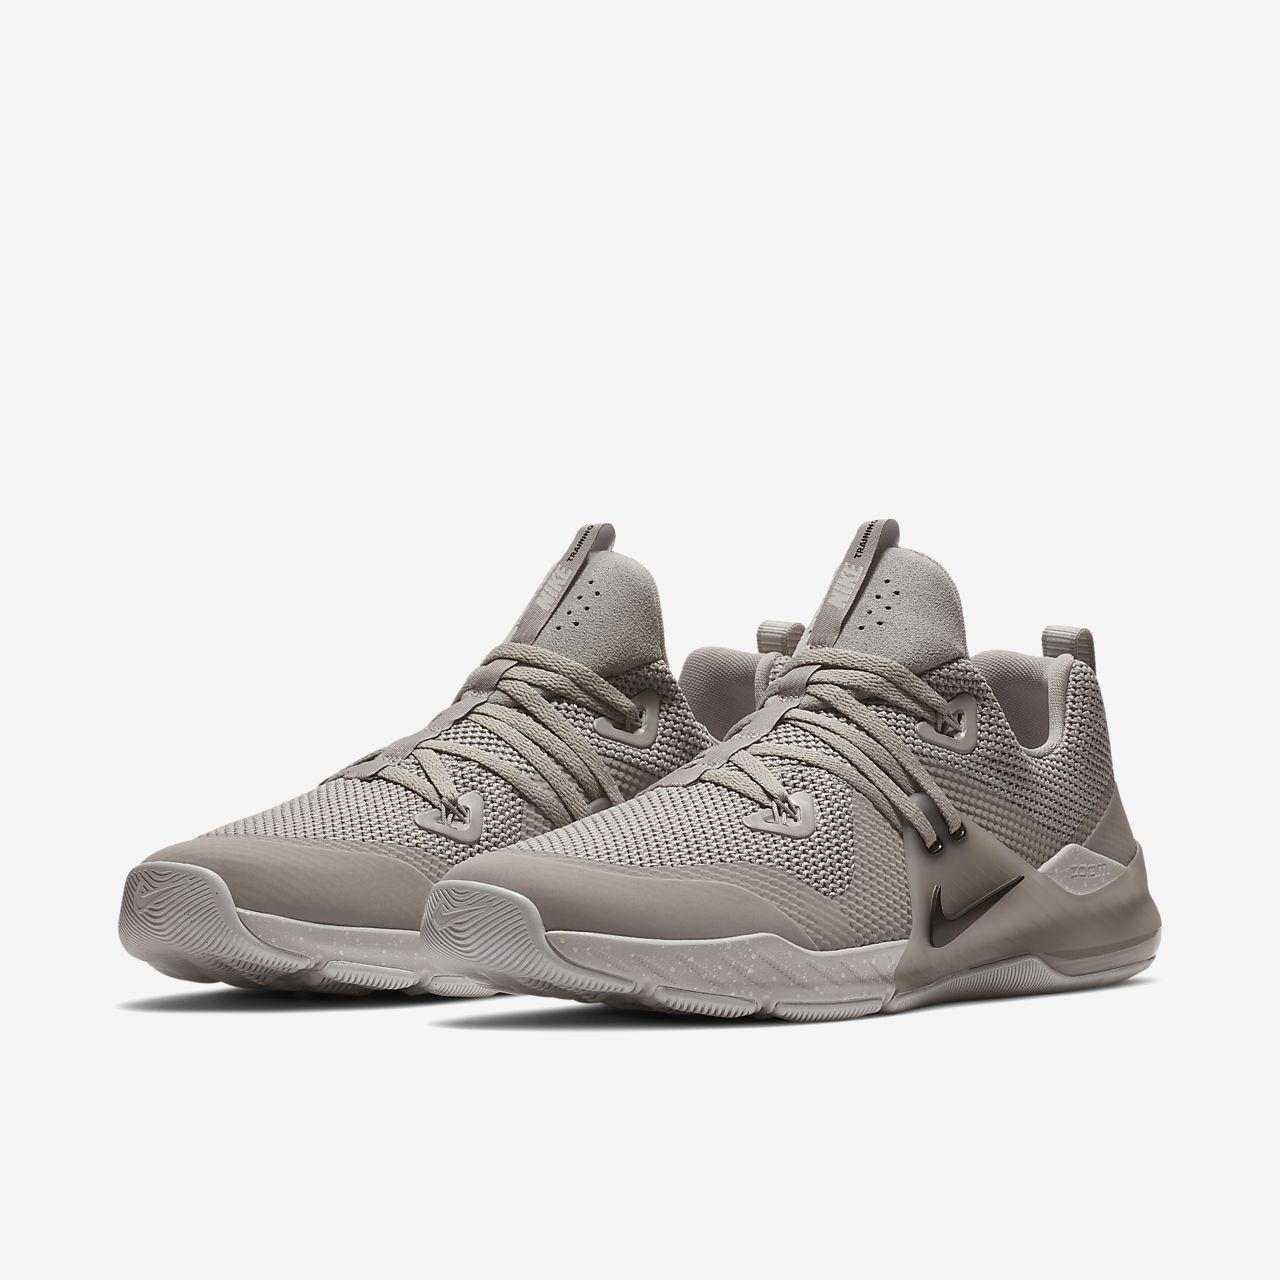 ... Nike Zoom Train Command Men's Bootcamp, Gym Shoe